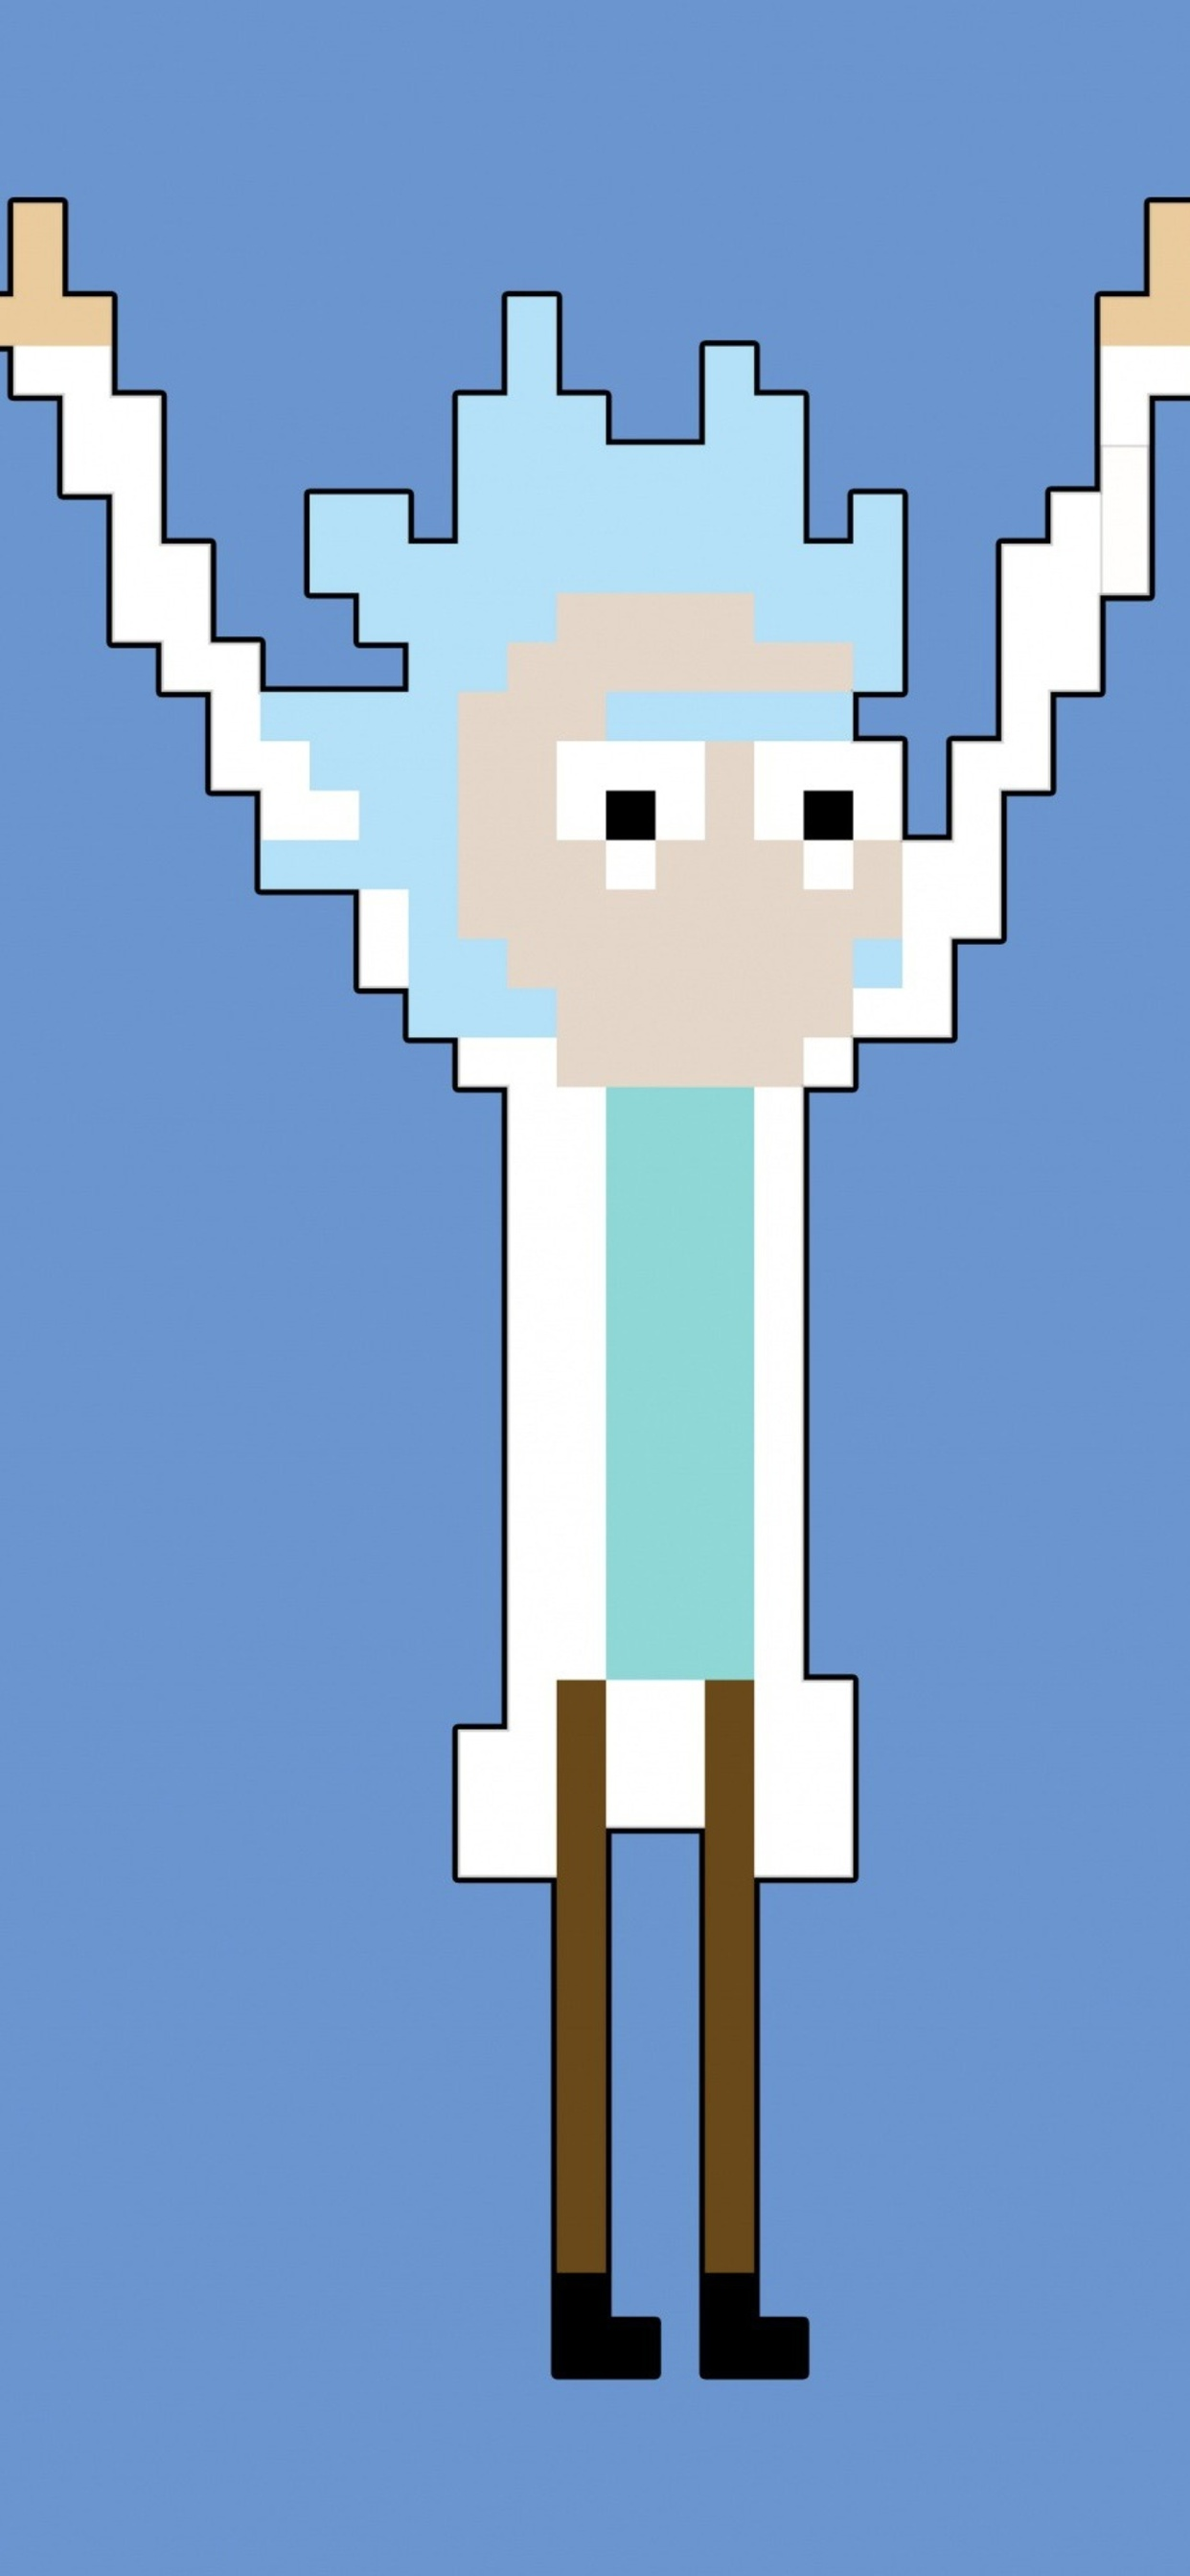 rick-8-bit-pixel-st.jpg